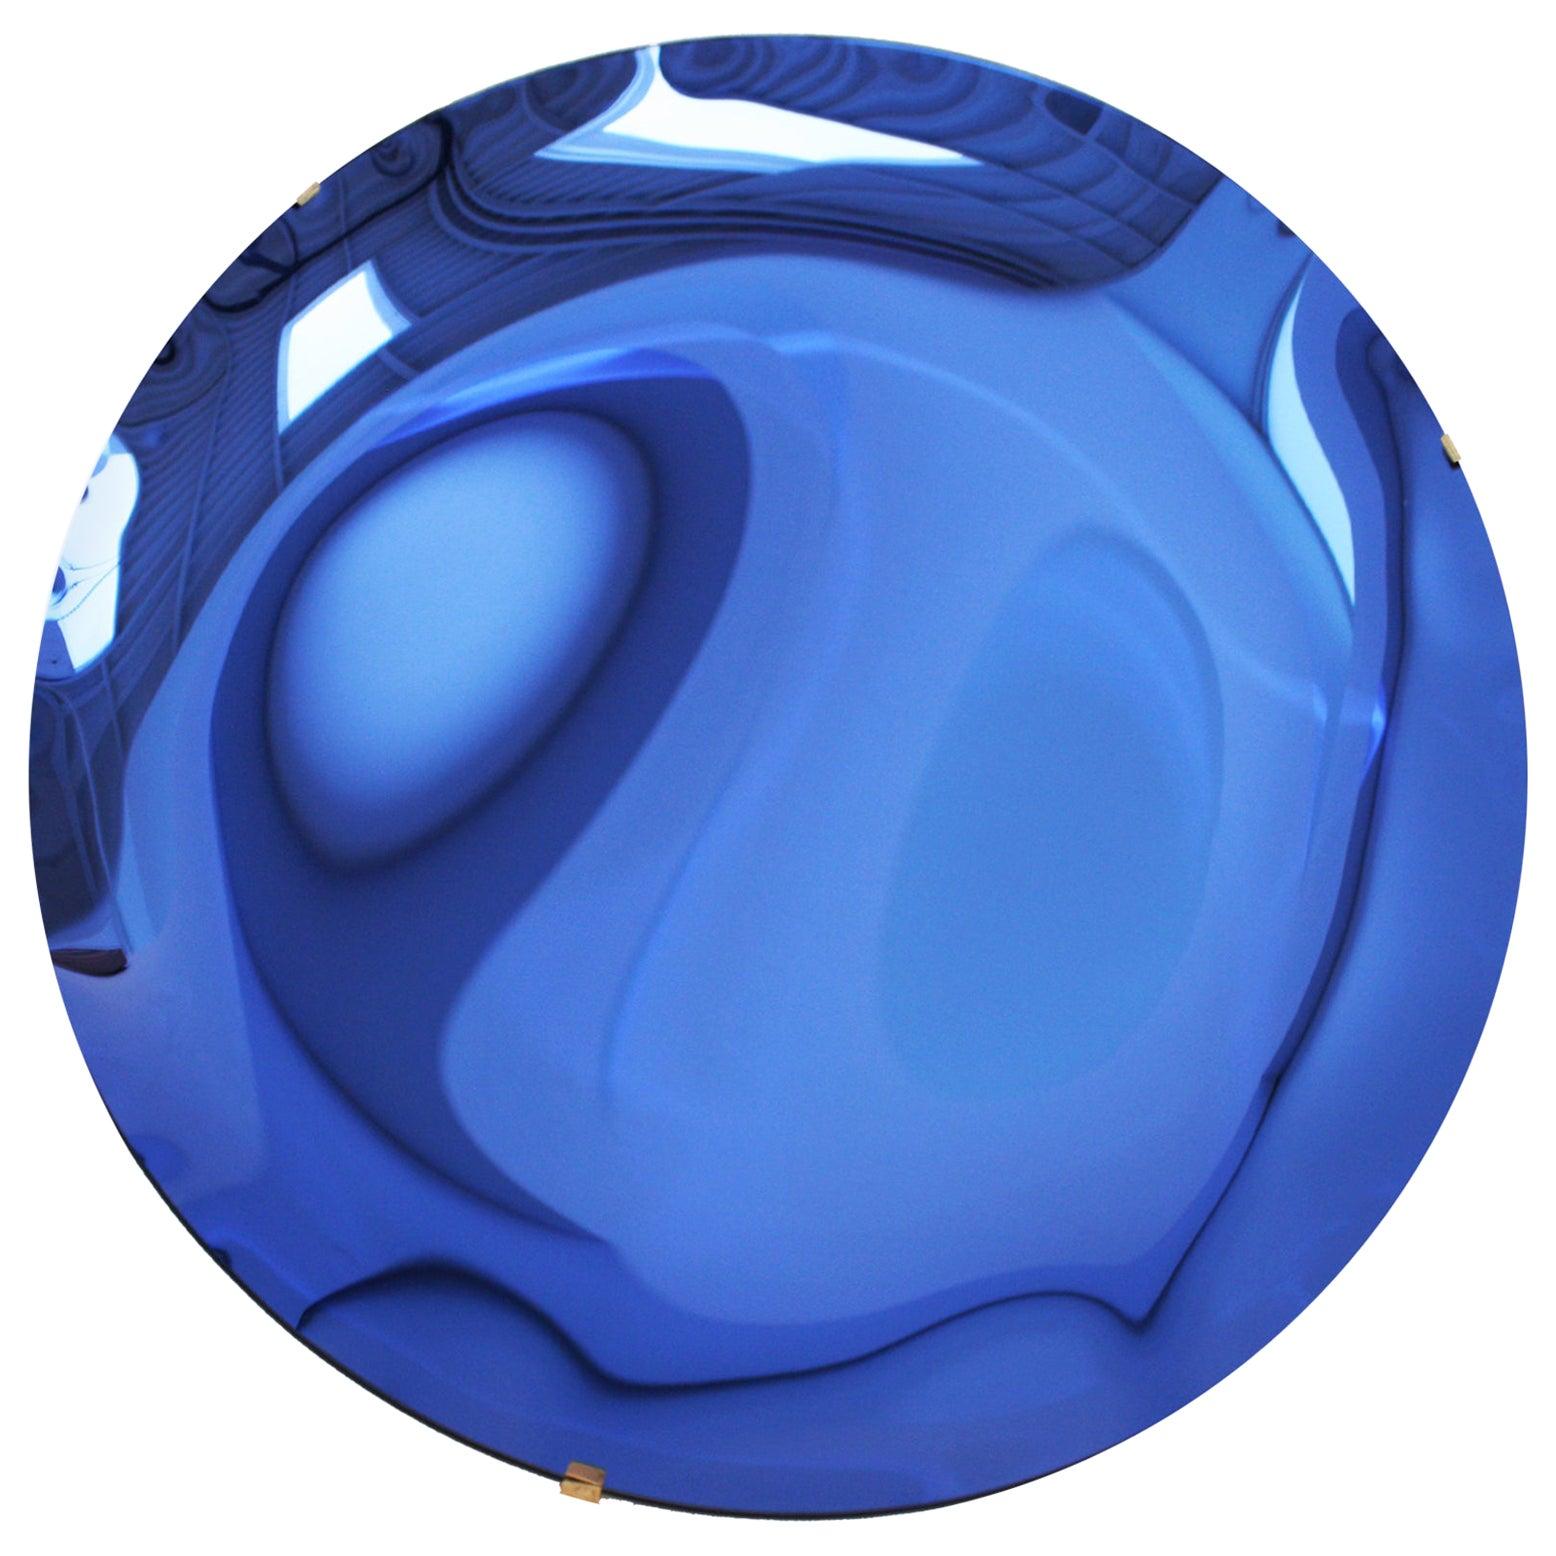 L.A. Studio Contemporary Modern Sculptural Concave Glass Italian Mirror